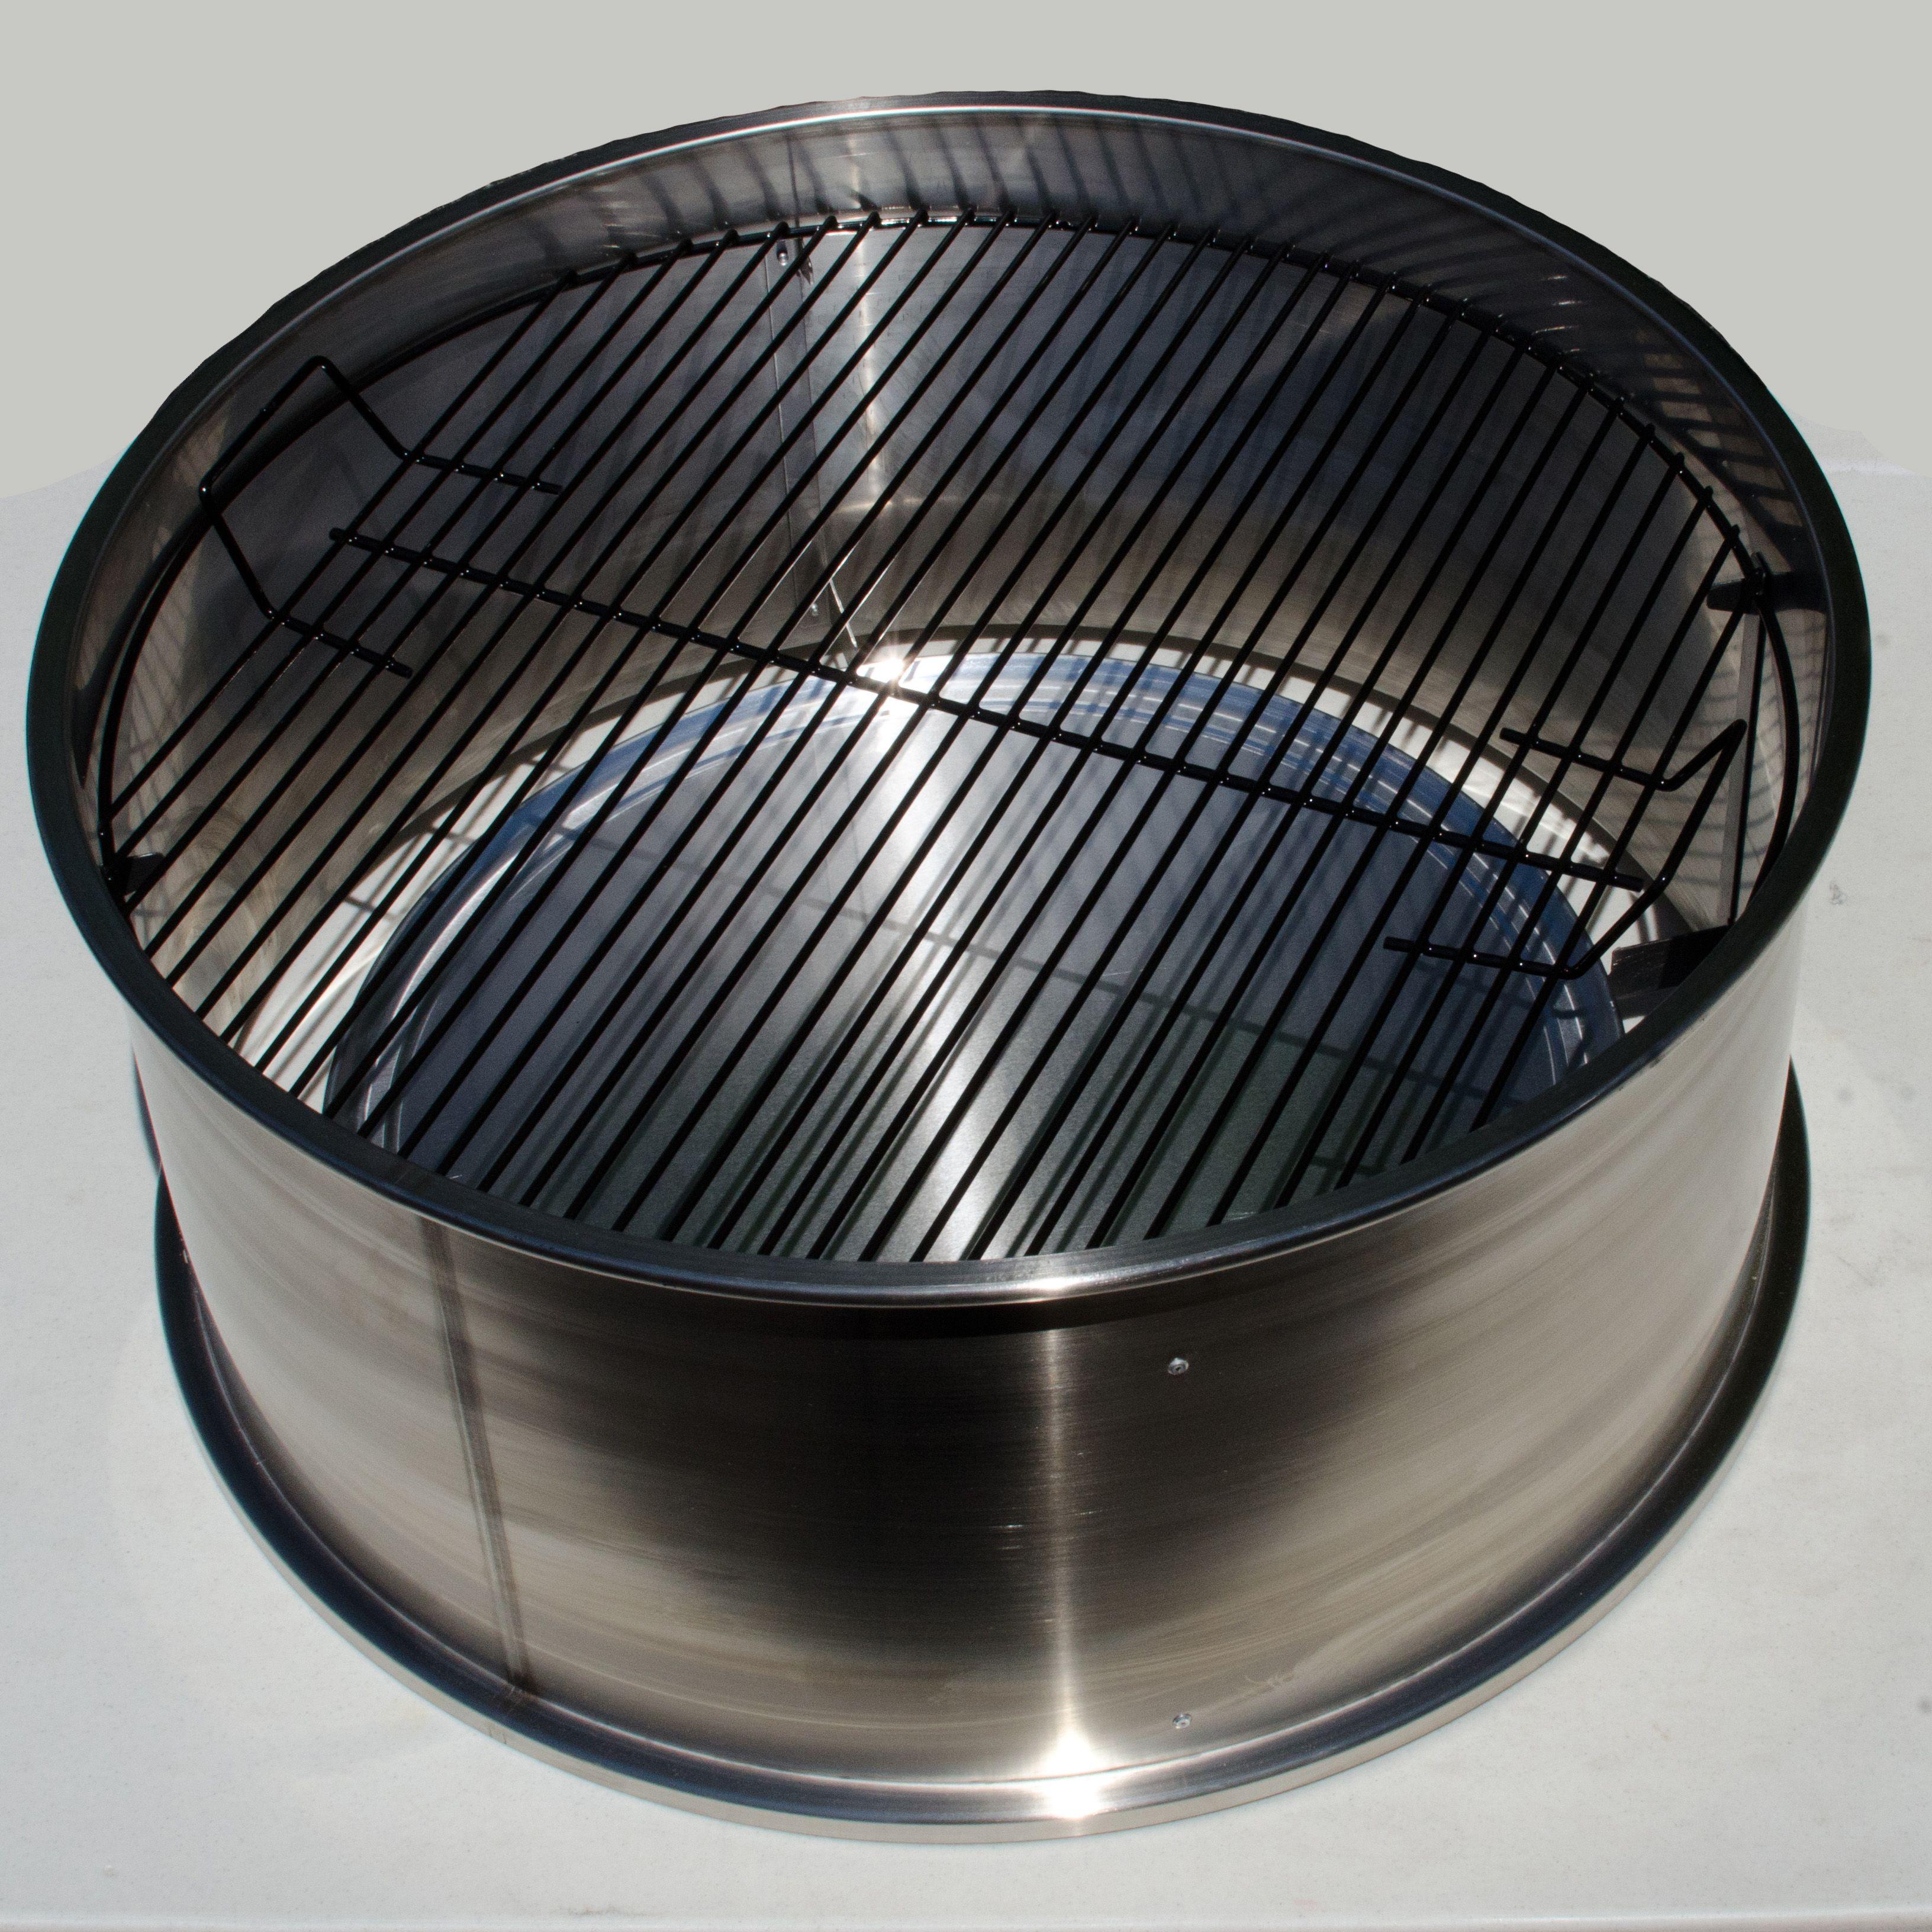 Cajun Bandit Convert Your Weber Kettle Into A Smoker Weber Smokey Mountain Weber Grill Accessories Custom Grill